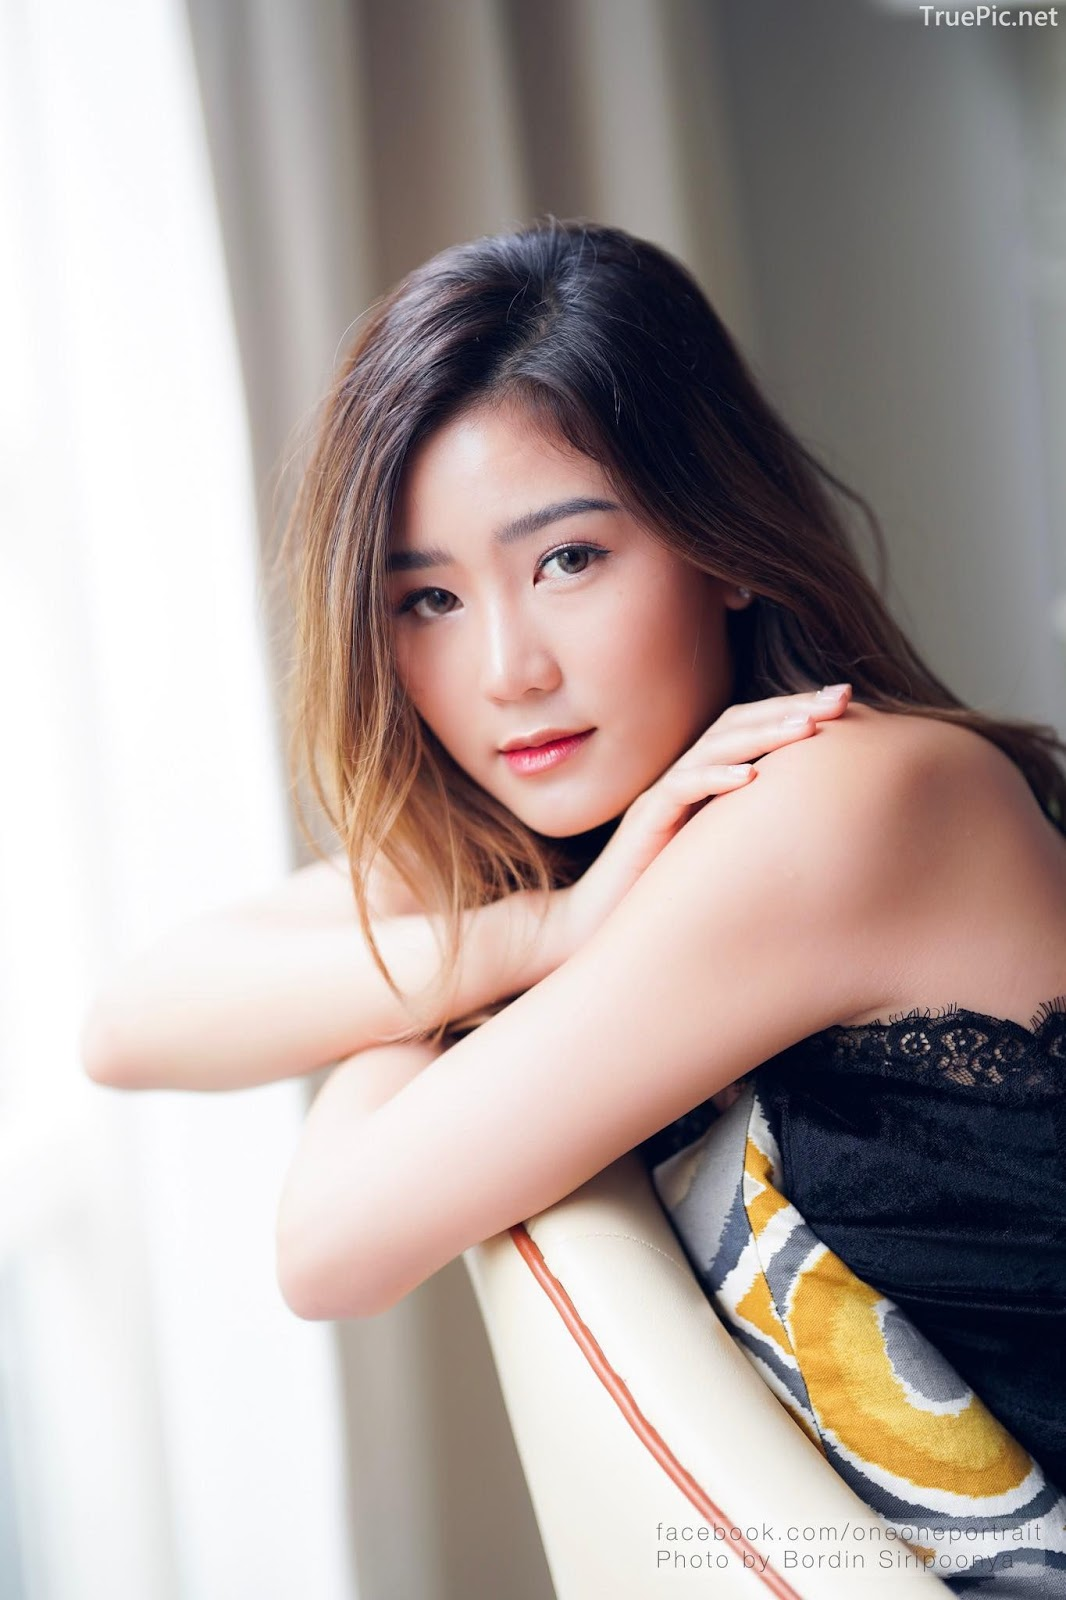 Thailand hot model Pattaravadee Boonmeesup vs Photo album Black Magic Sleepwear - Picture 5